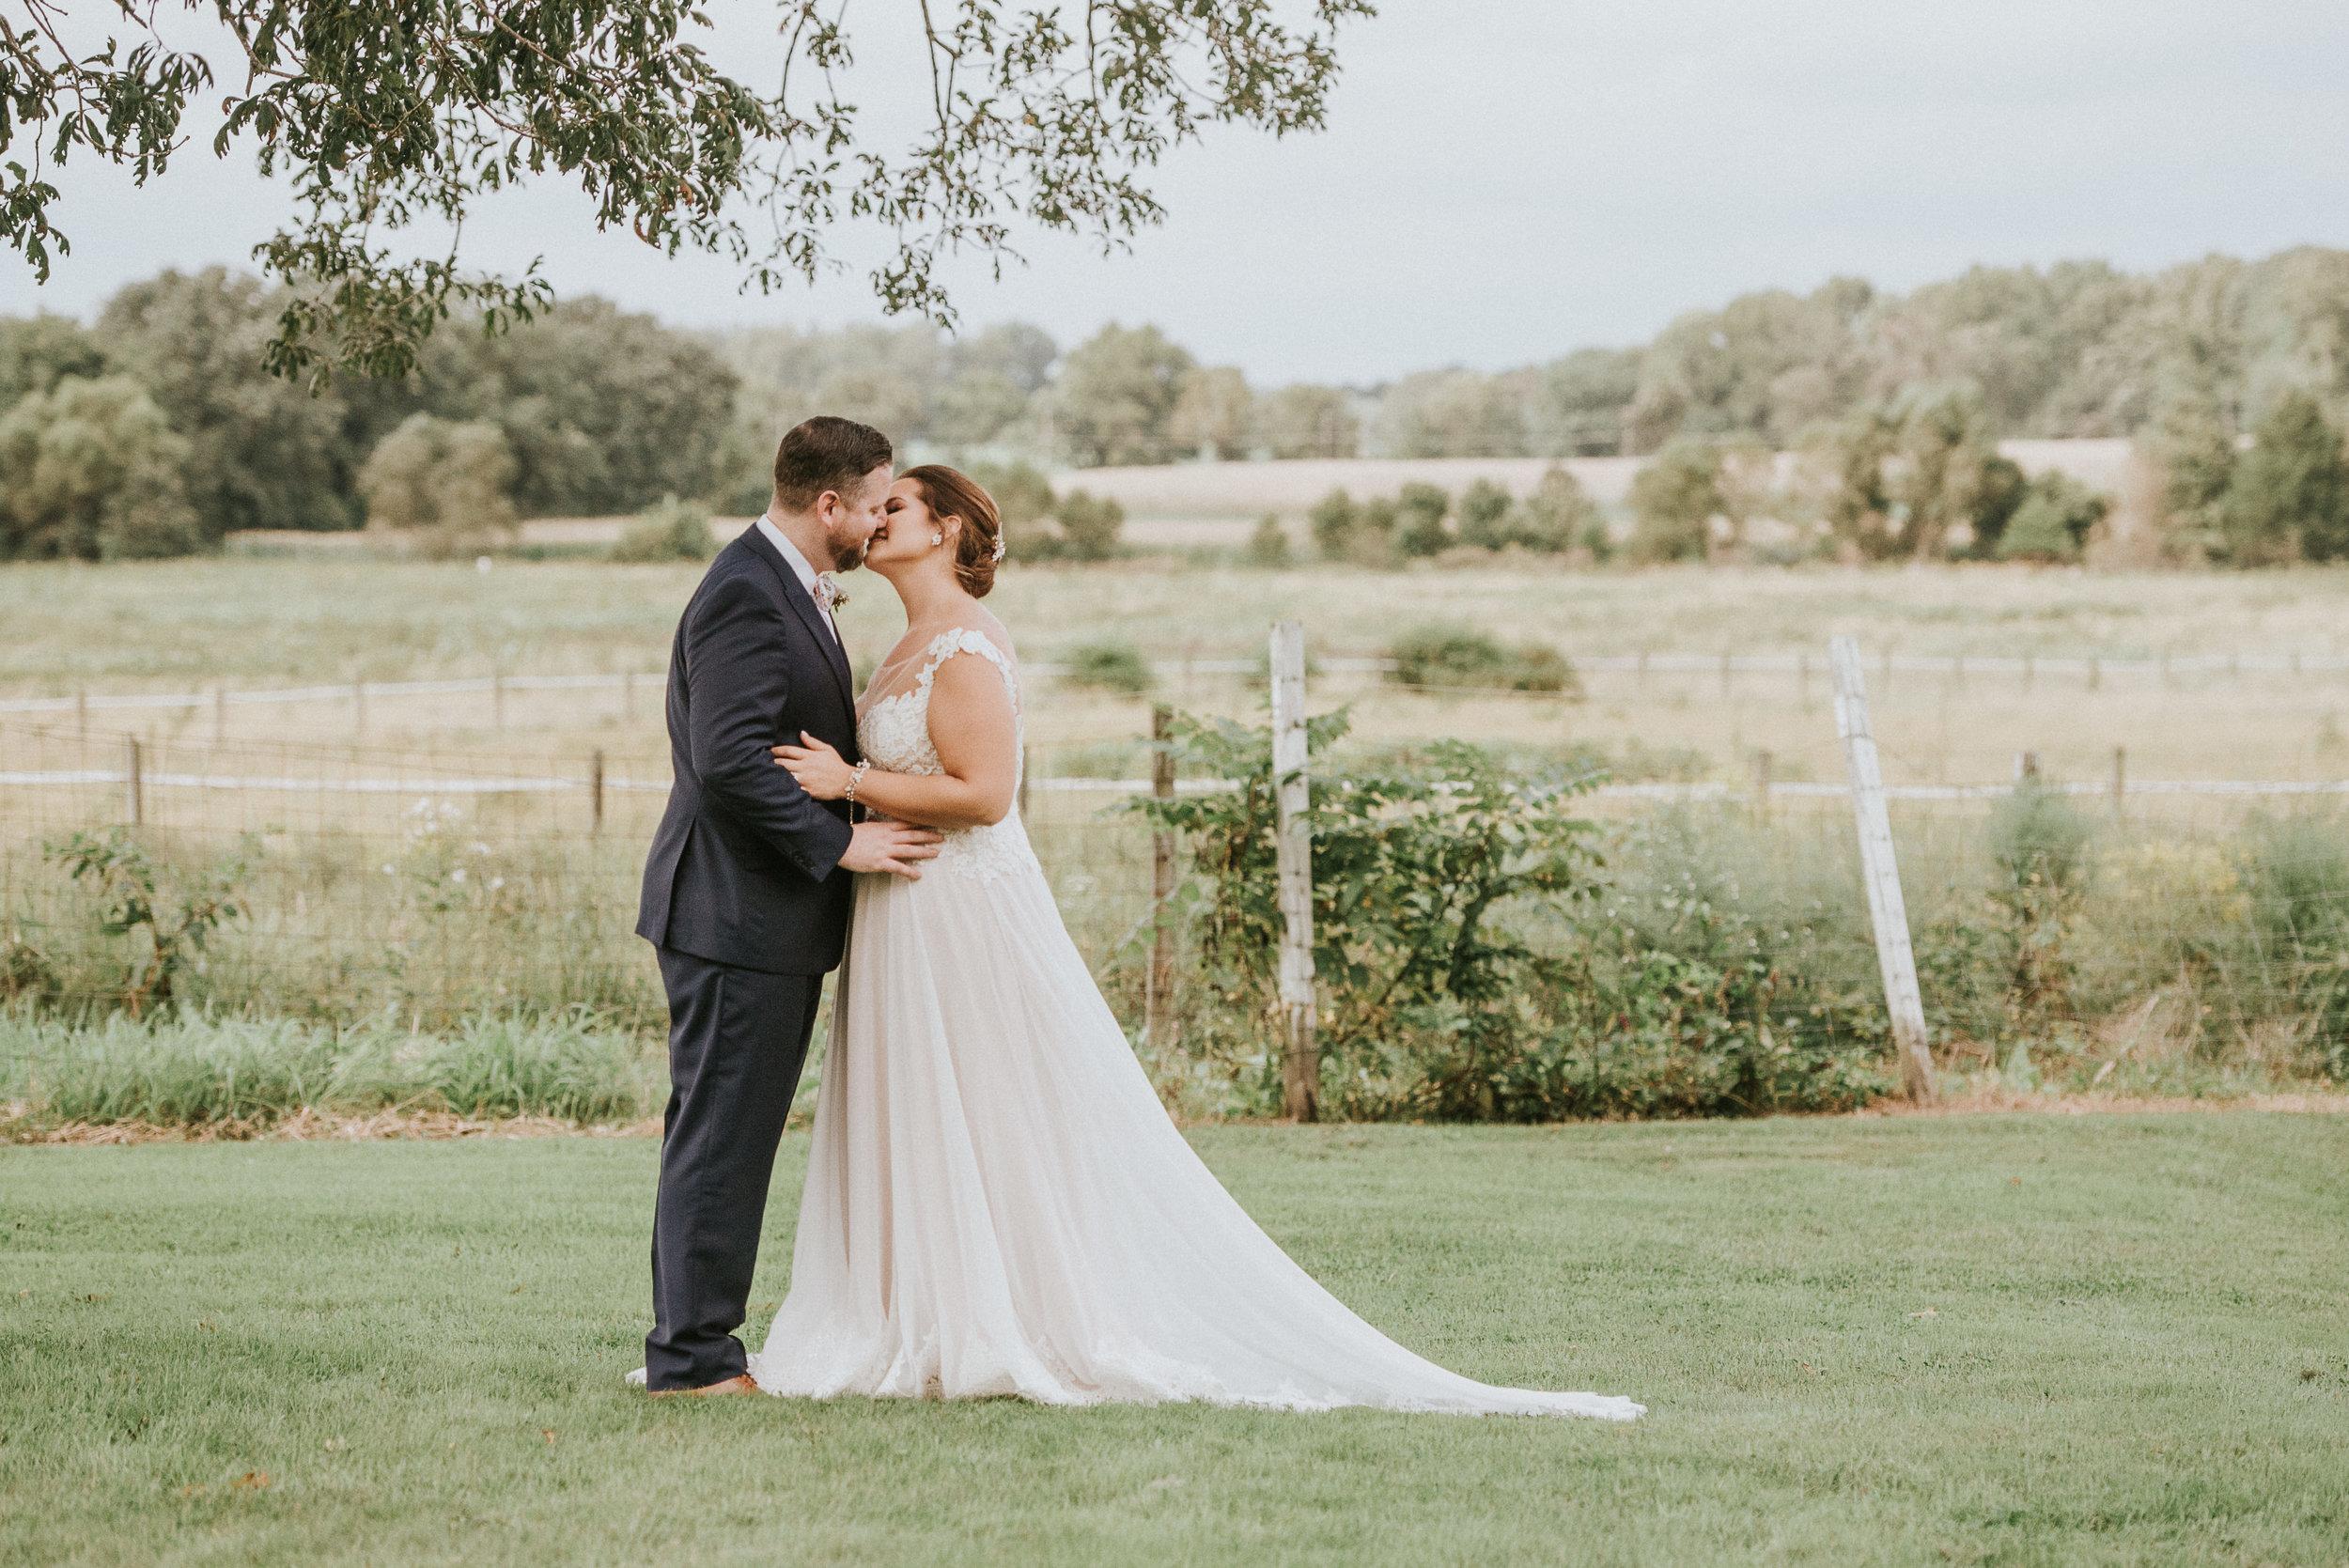 Johnson-Locust-Hall-Farm-Wedding-Christine-Kevin-500.jpg